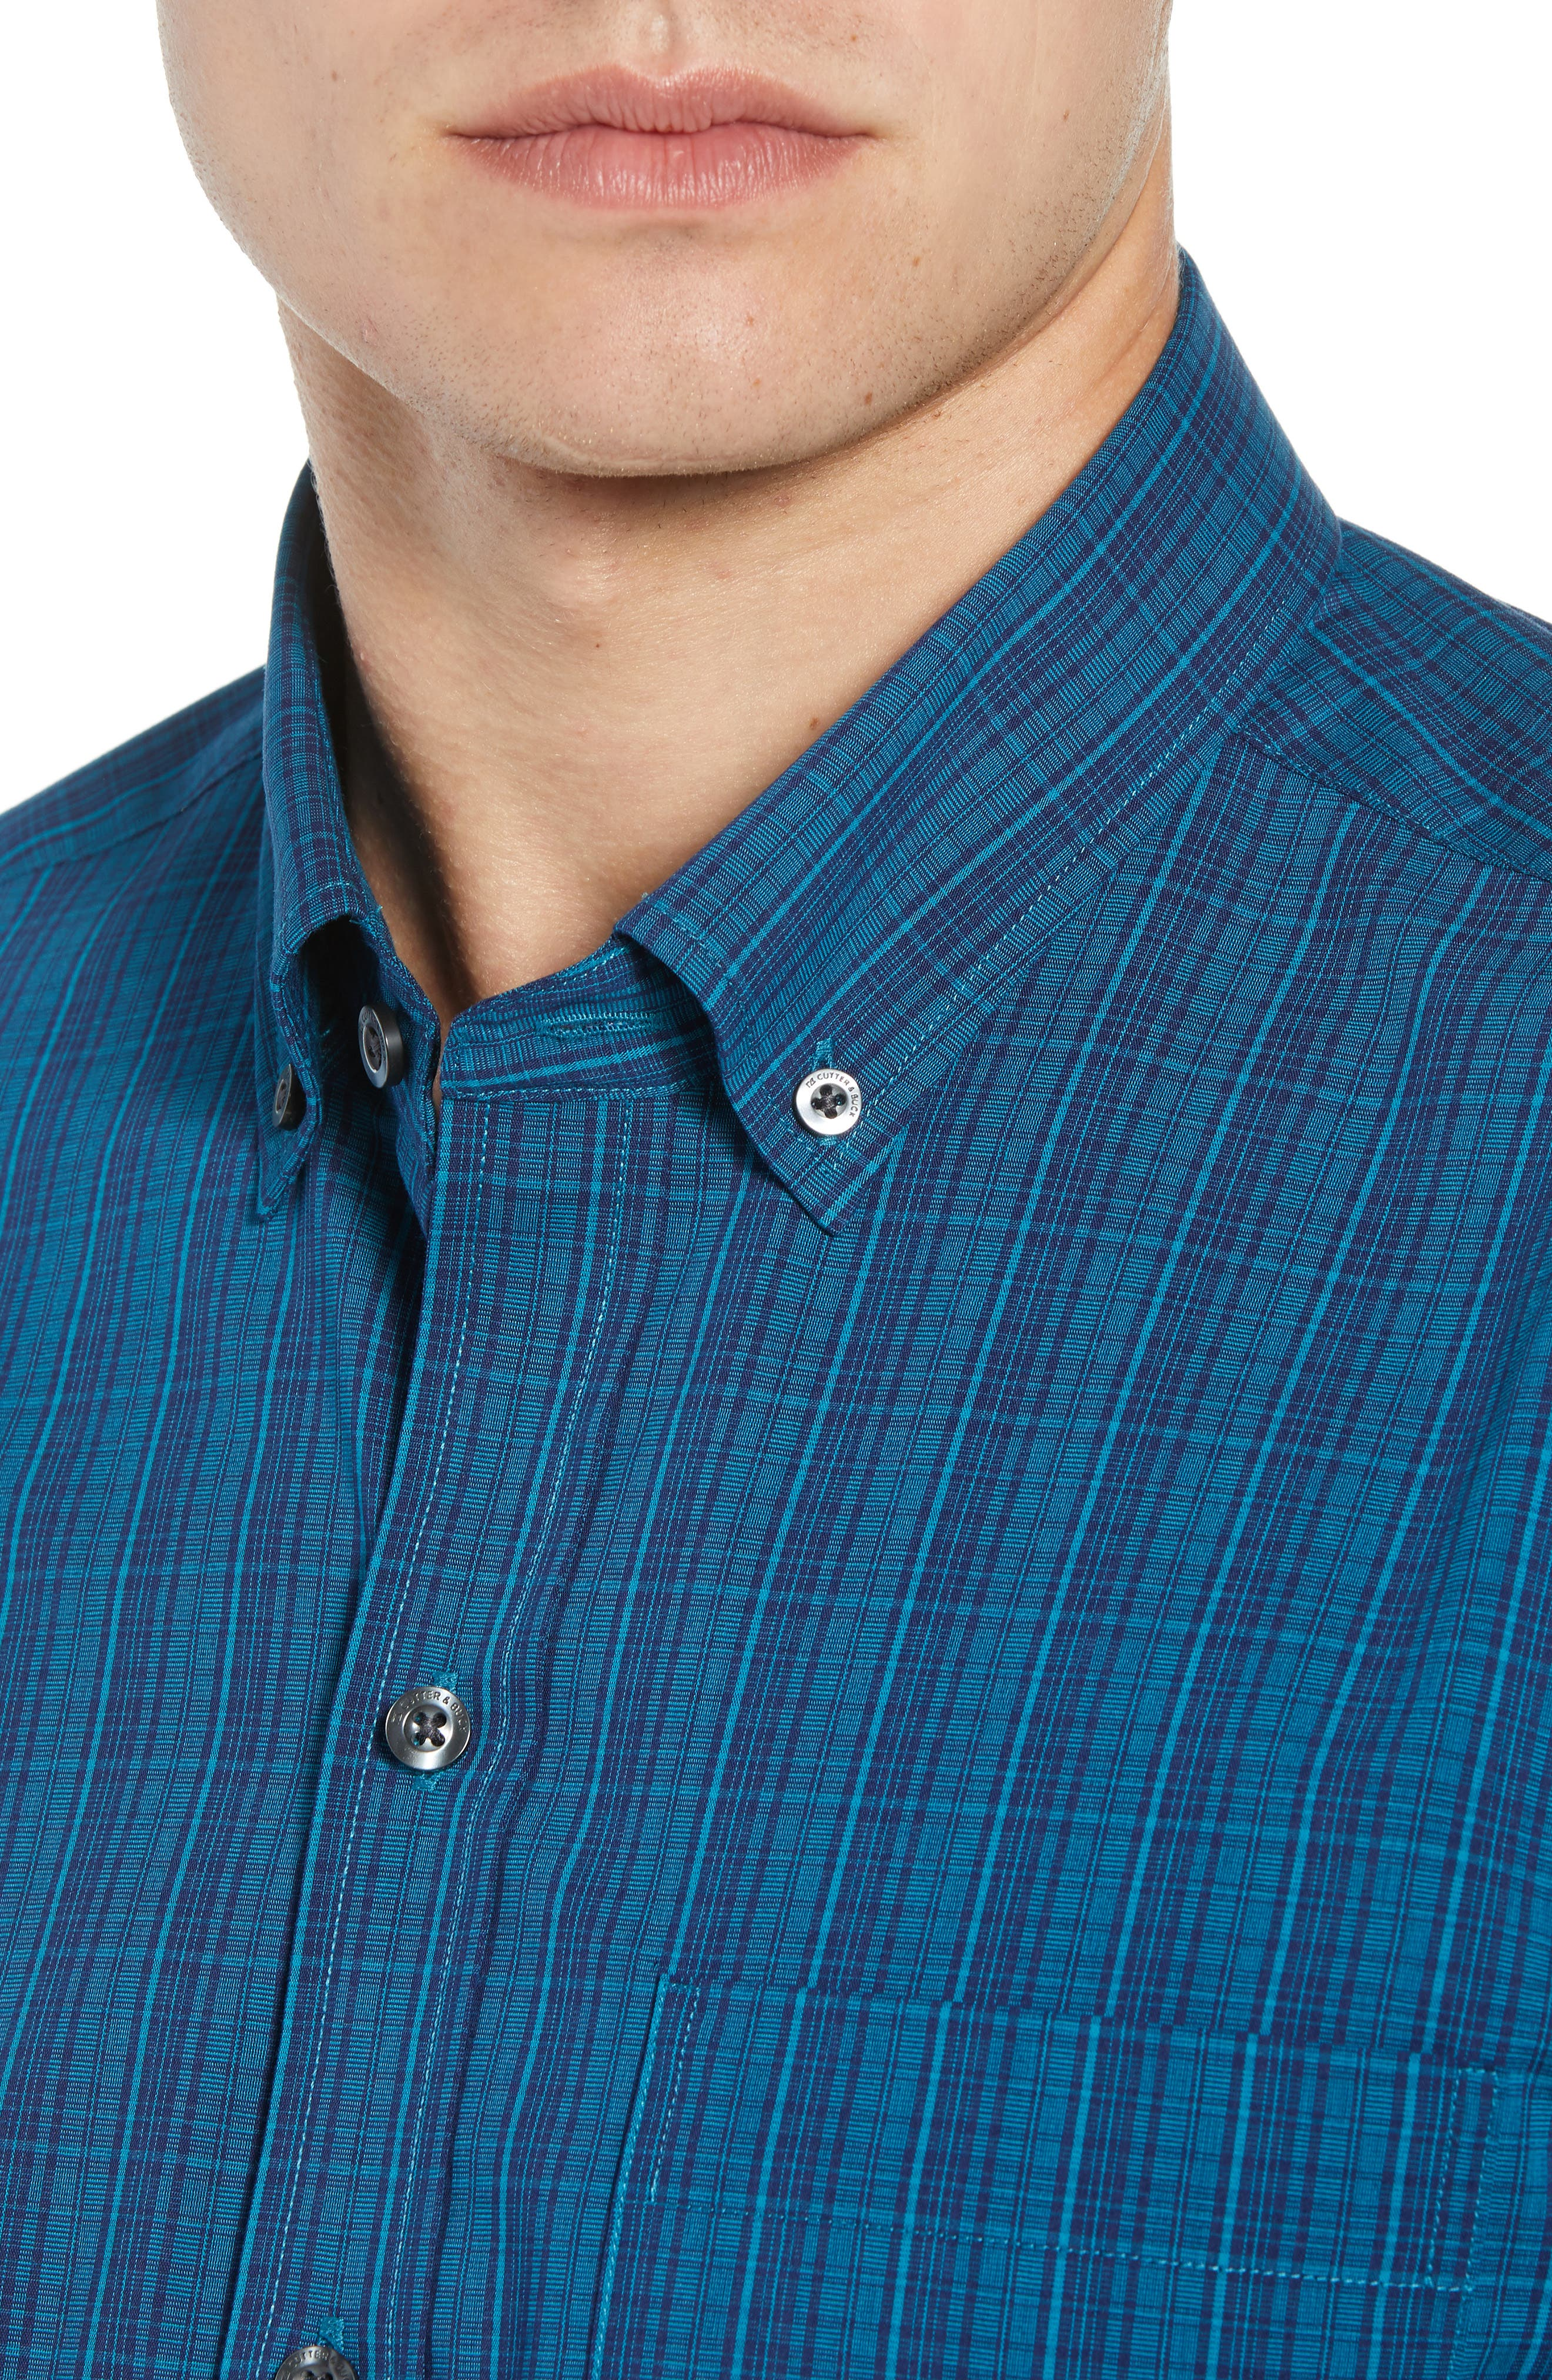 Logan Regular Fit Non-Iron Sport Shirt,                             Alternate thumbnail 2, color,                             400